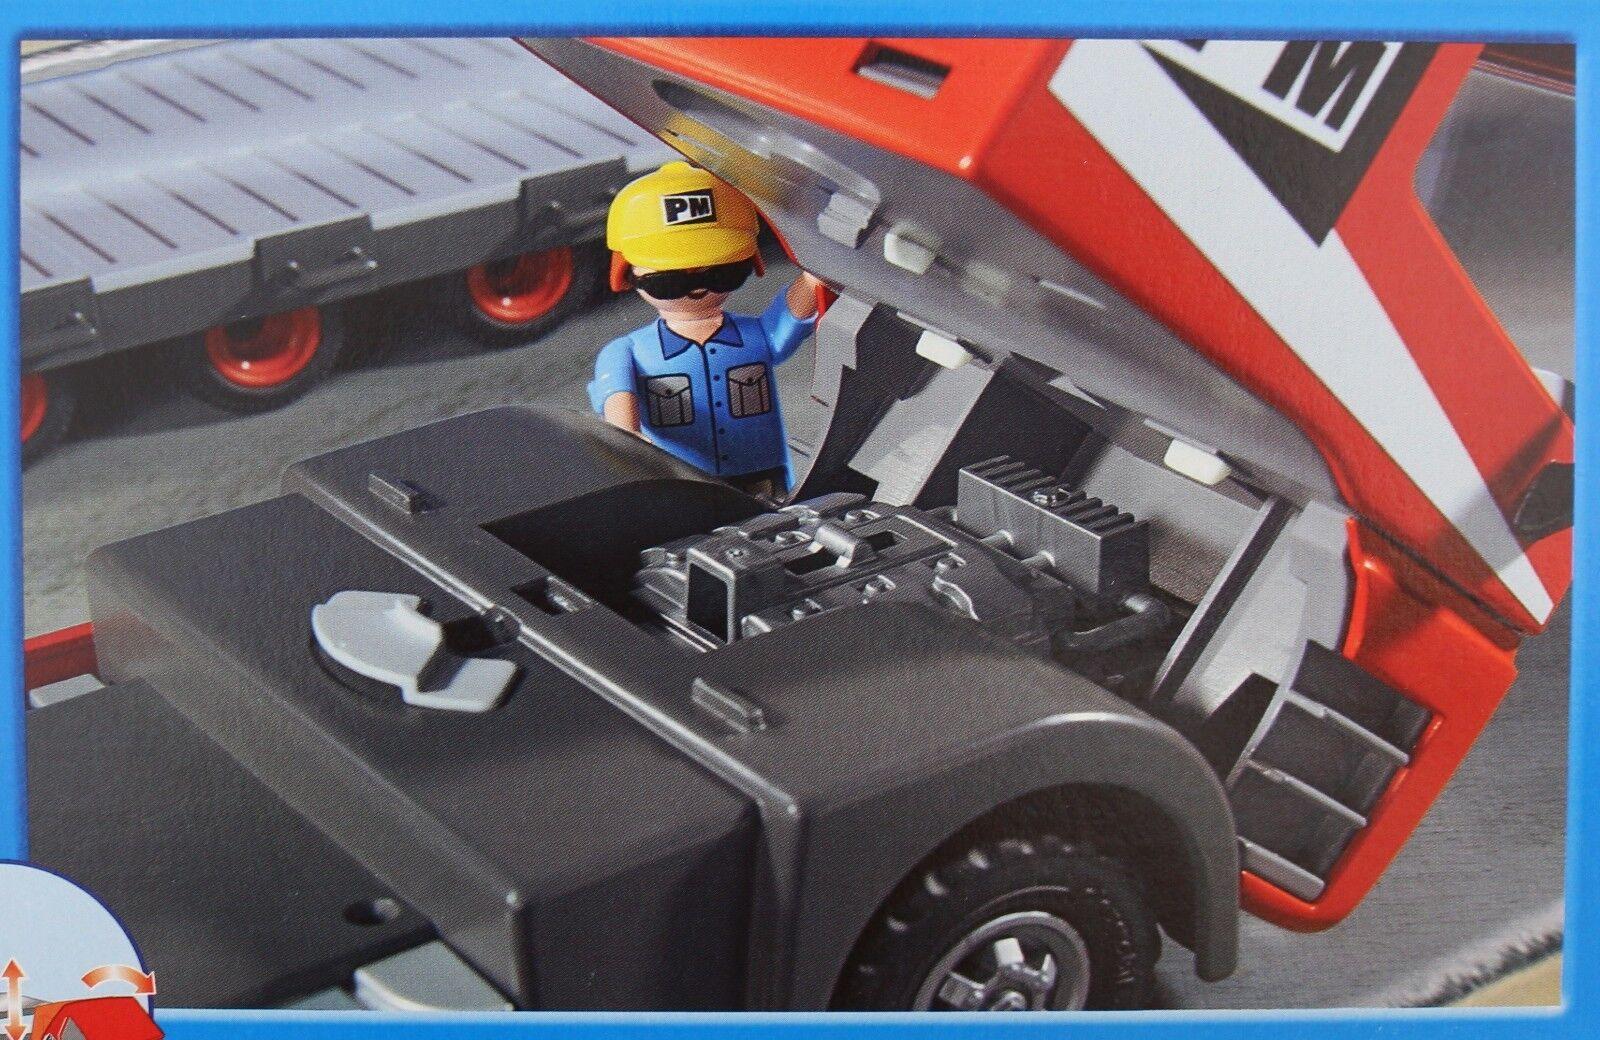 PLAYMOBIL 5467 Schwertransporter LKW Laster Laster Laster Baustelle Tieflader pastzu 5469 5468 de799e